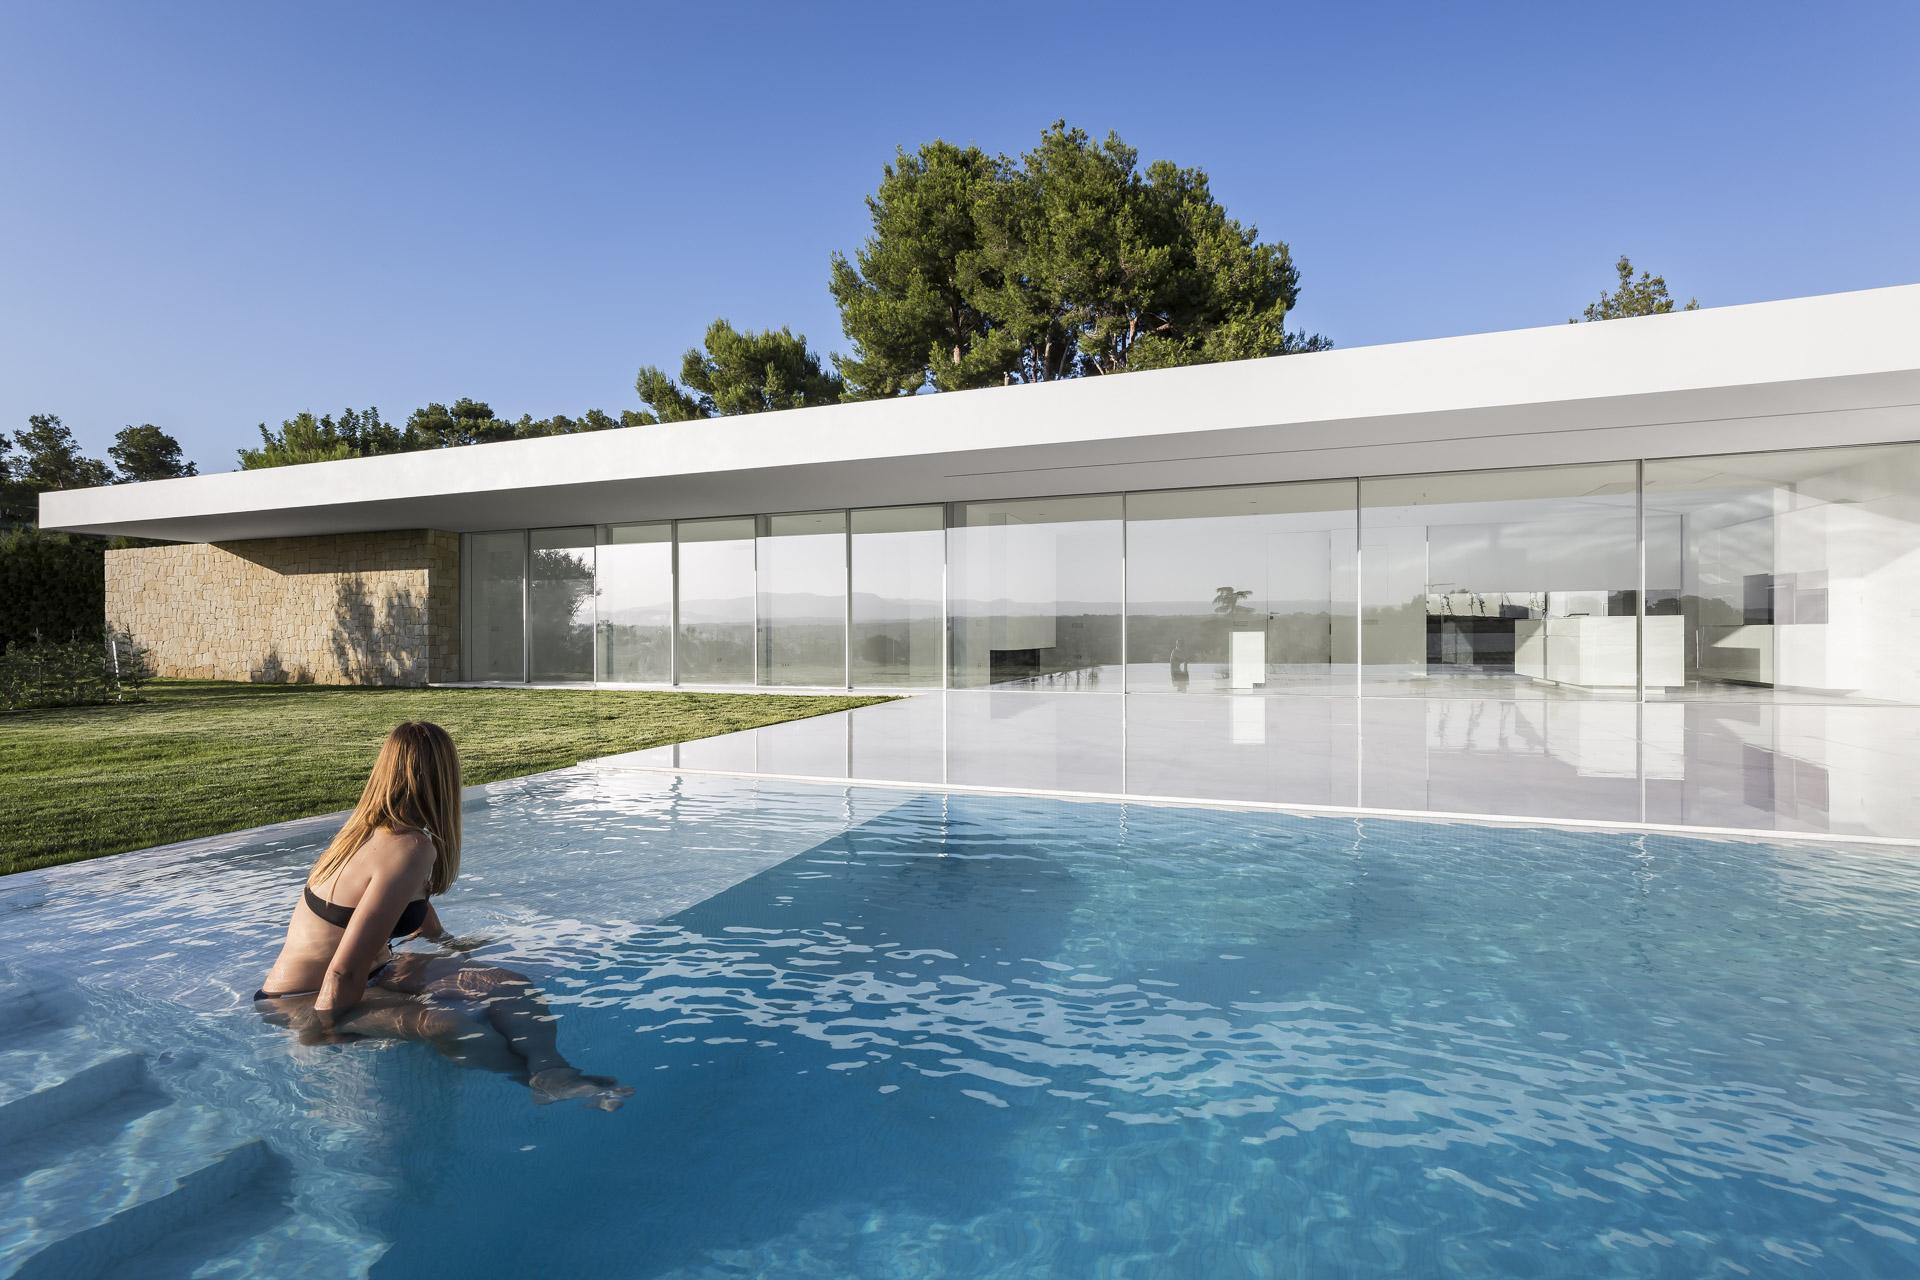 fotografia-arquitectura-valencia-german-cabo-gallardo-llopis-villamarchante-vivienda-43